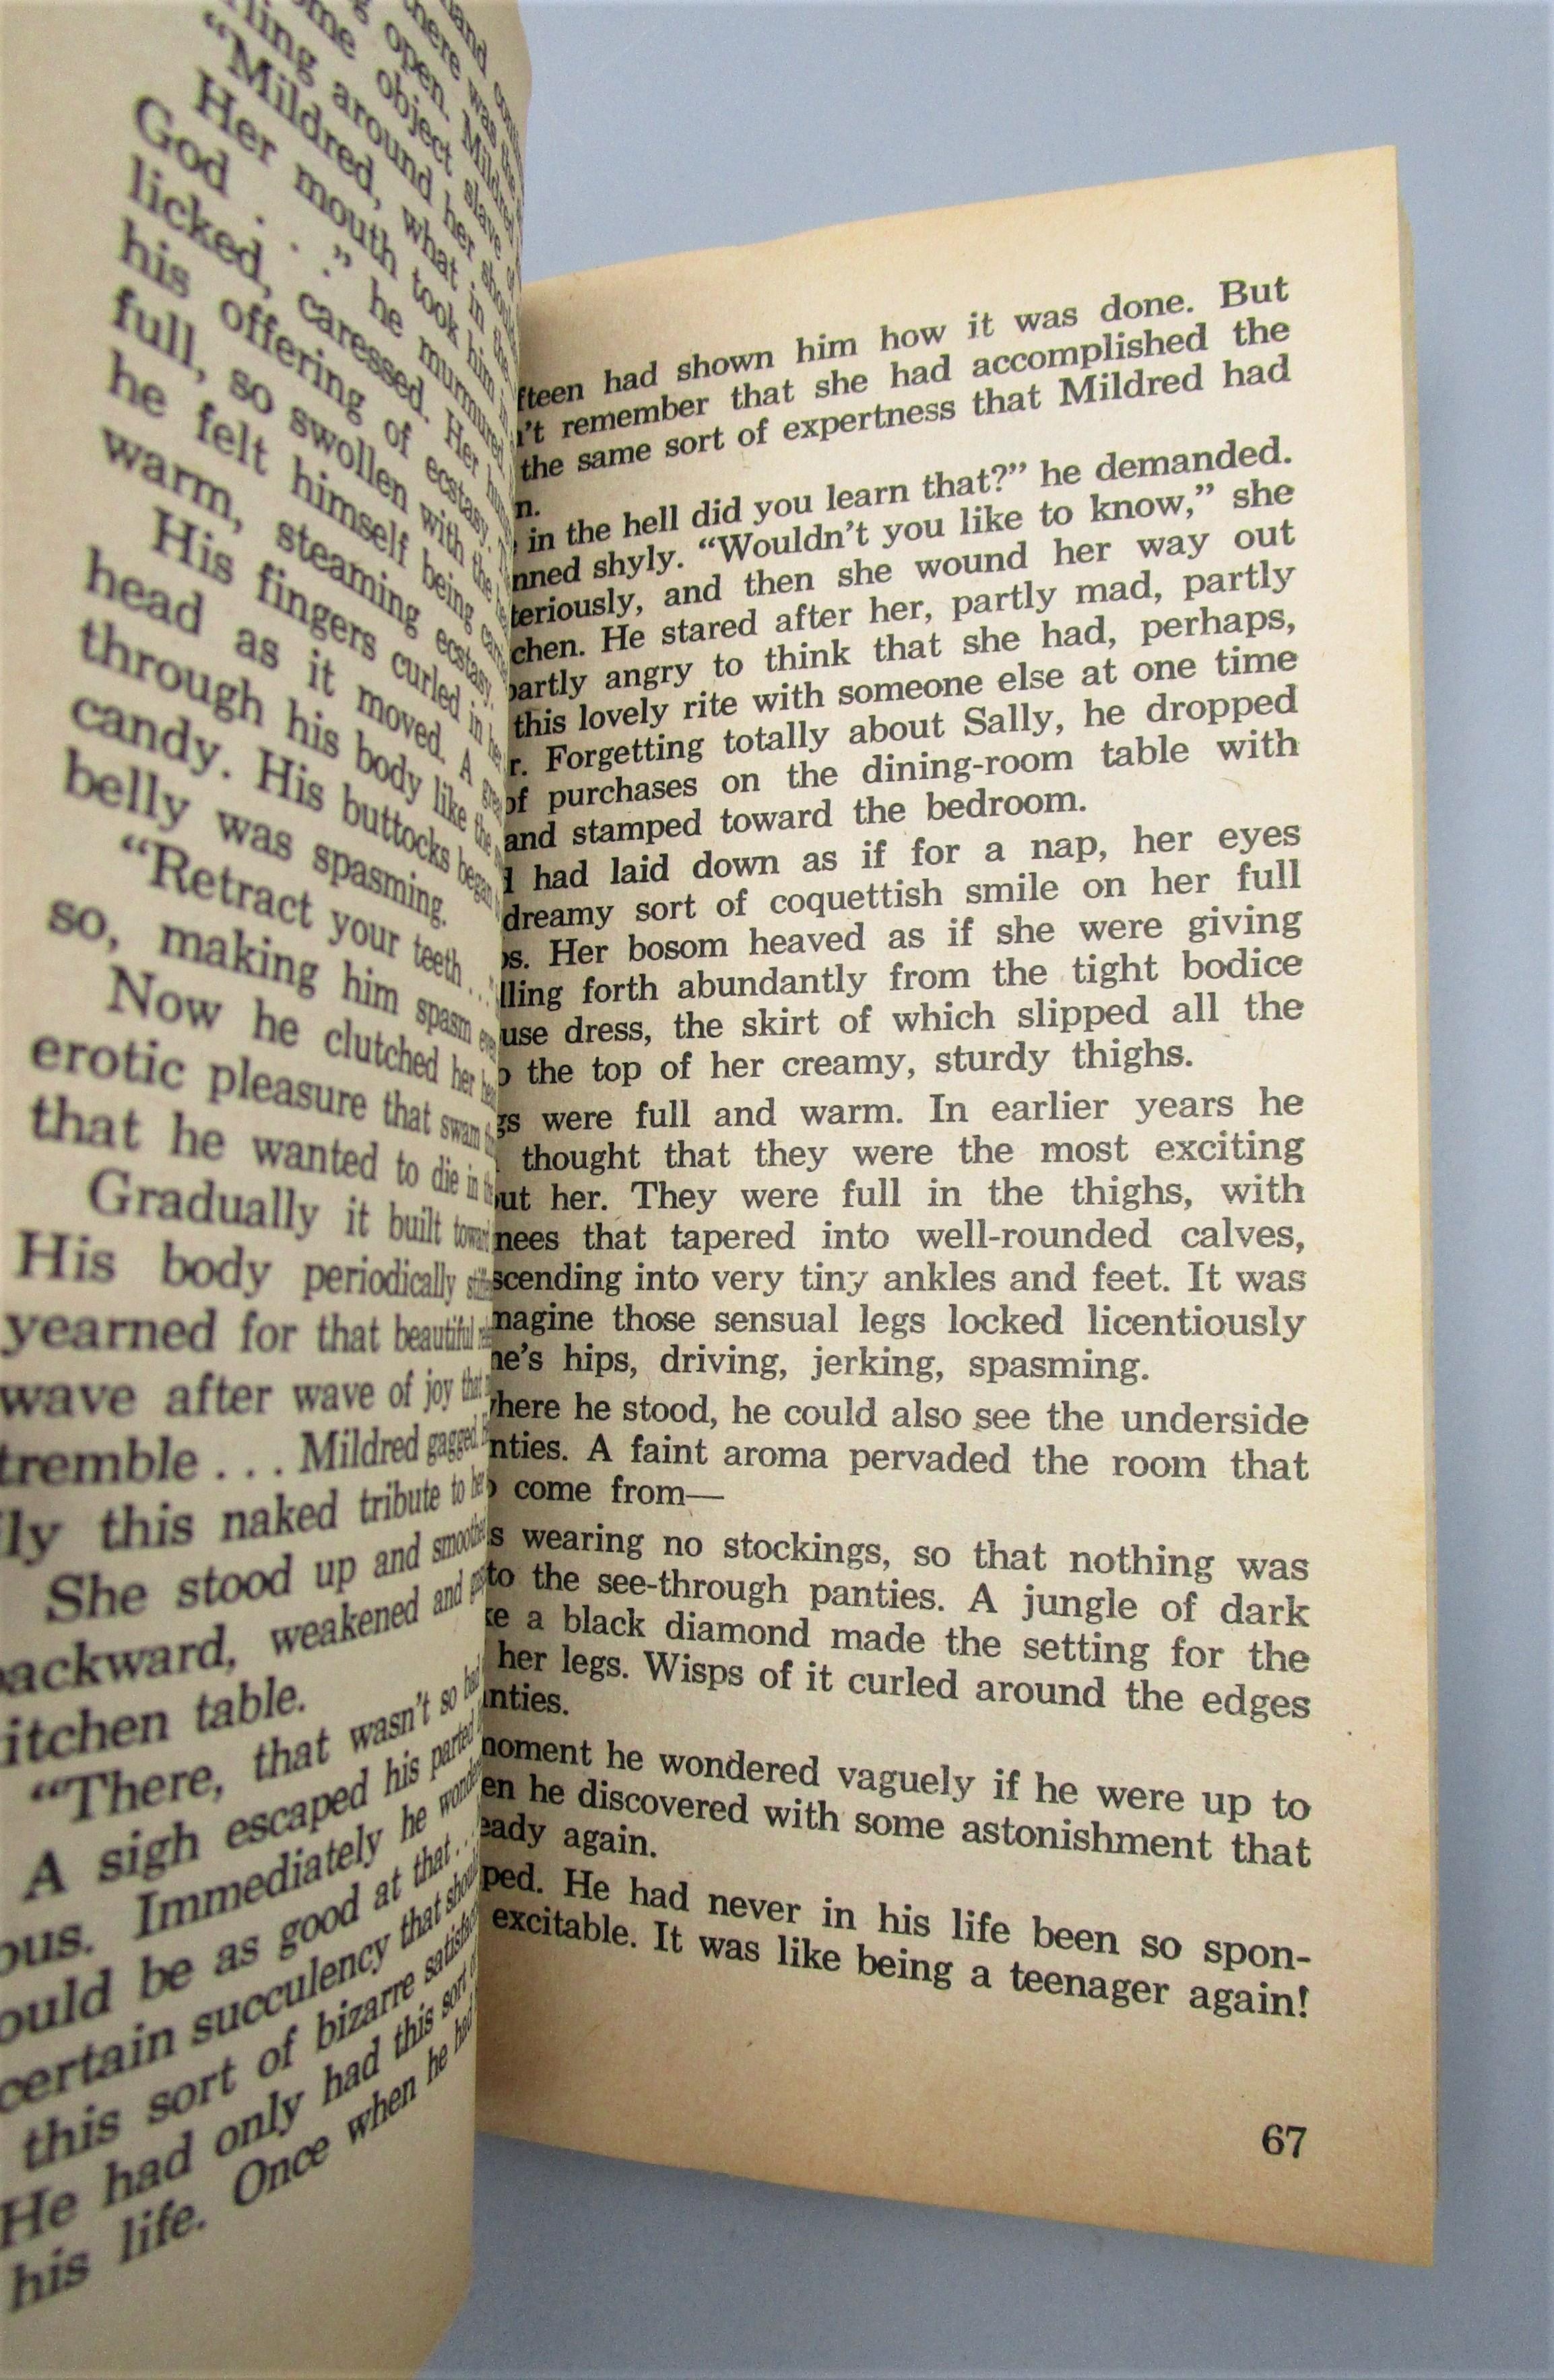 TEENAGE TARTS, by Raven Hughes - 1967